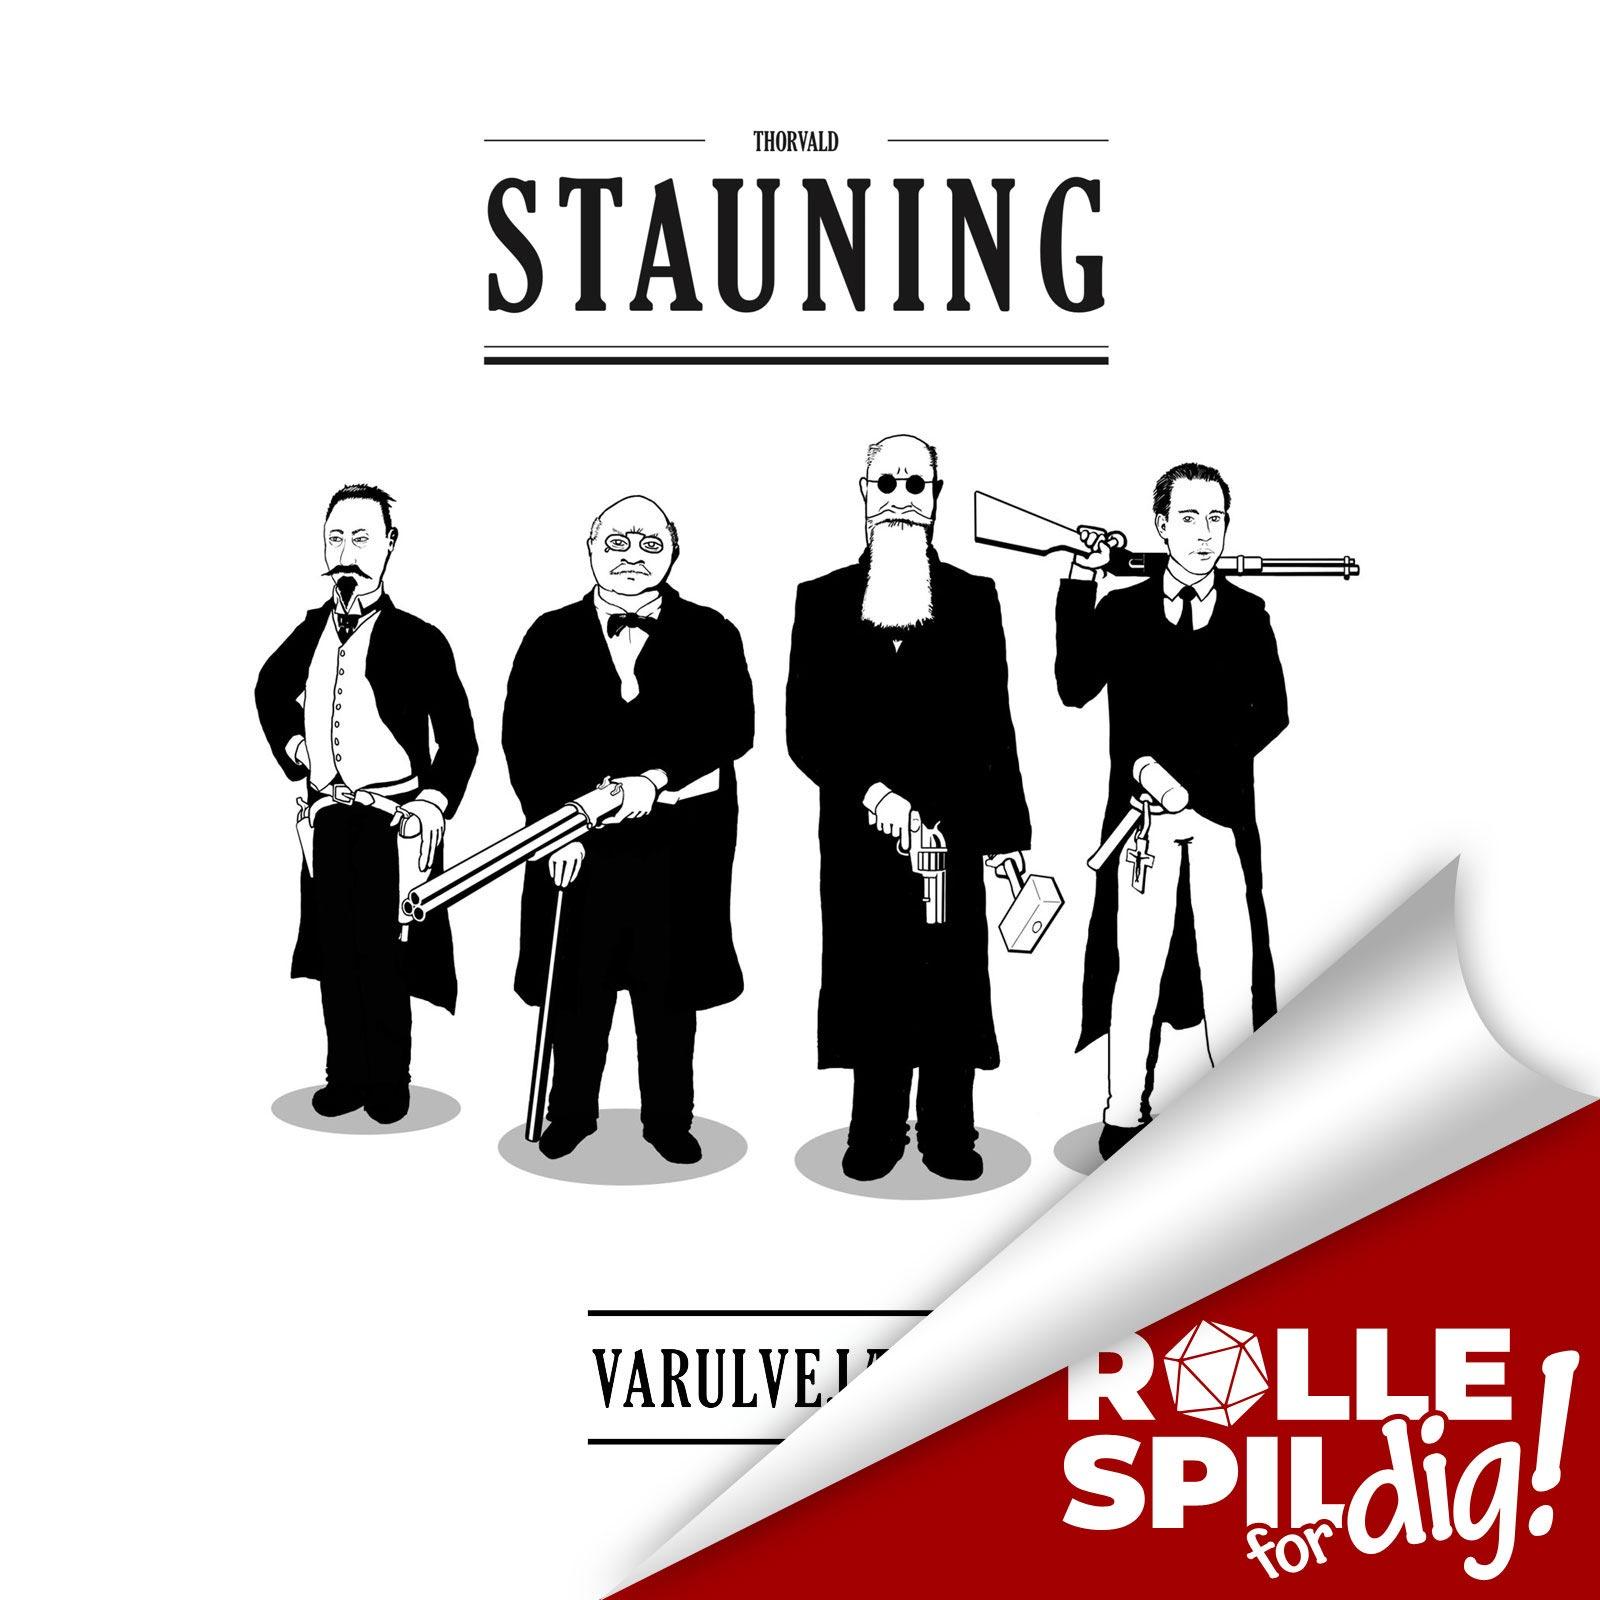 Thorvald Stauning Varulvejæger - 3/3 - Stauning og kaos!